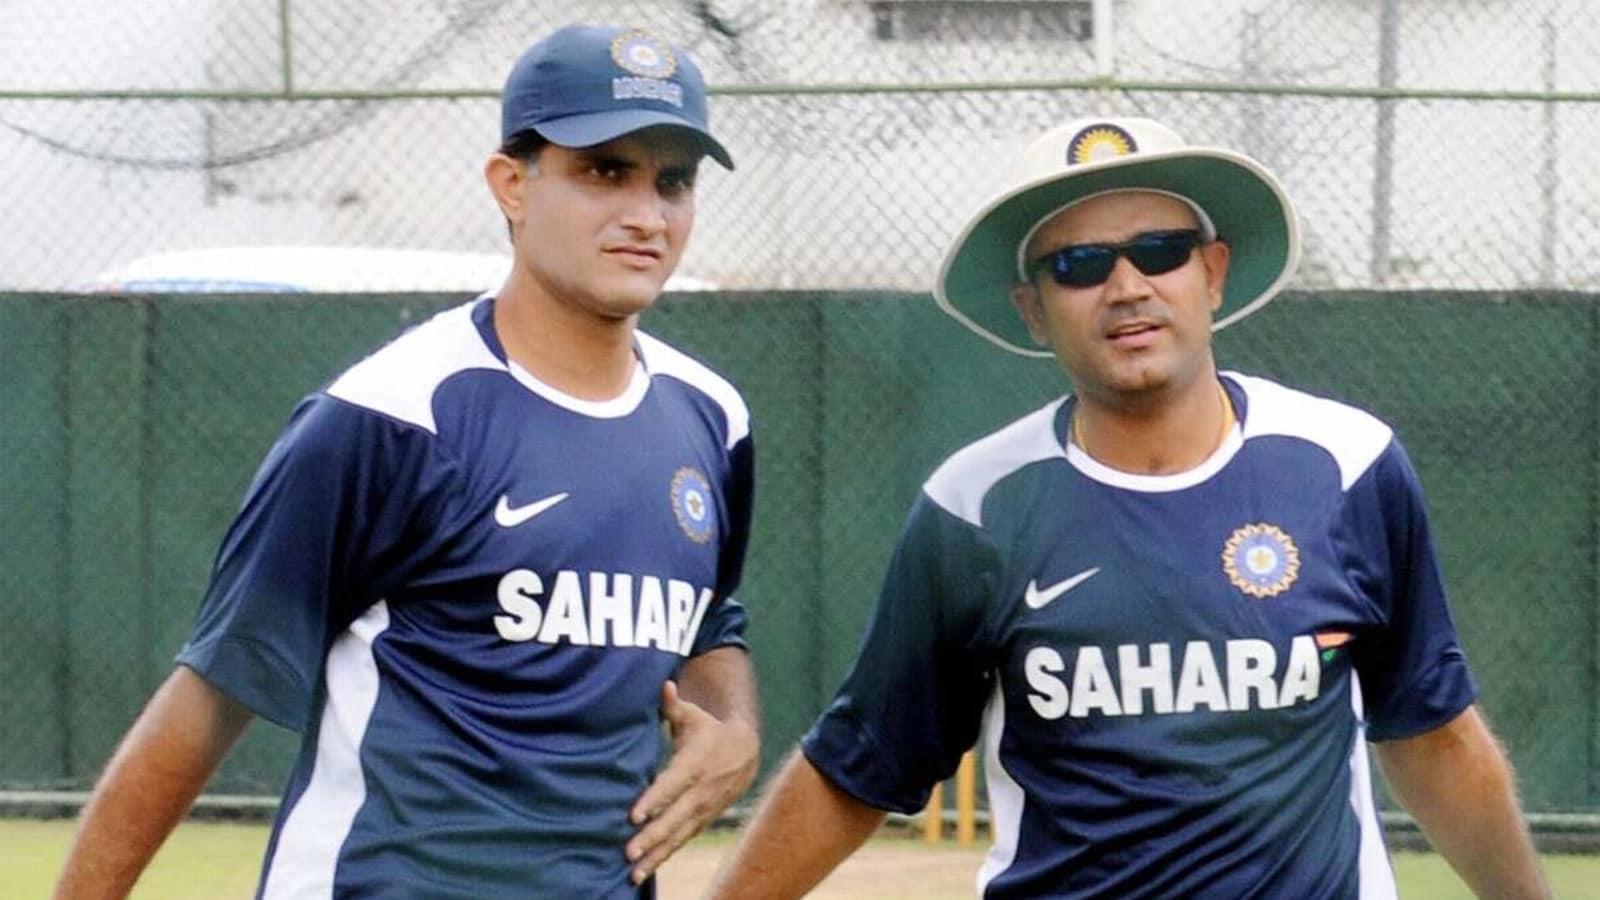 'After Gavaskar, I haven't seen a better Indian Test opening batsman than him': Sourav Ganguly hails Virender Sehwag - Hindustan Times